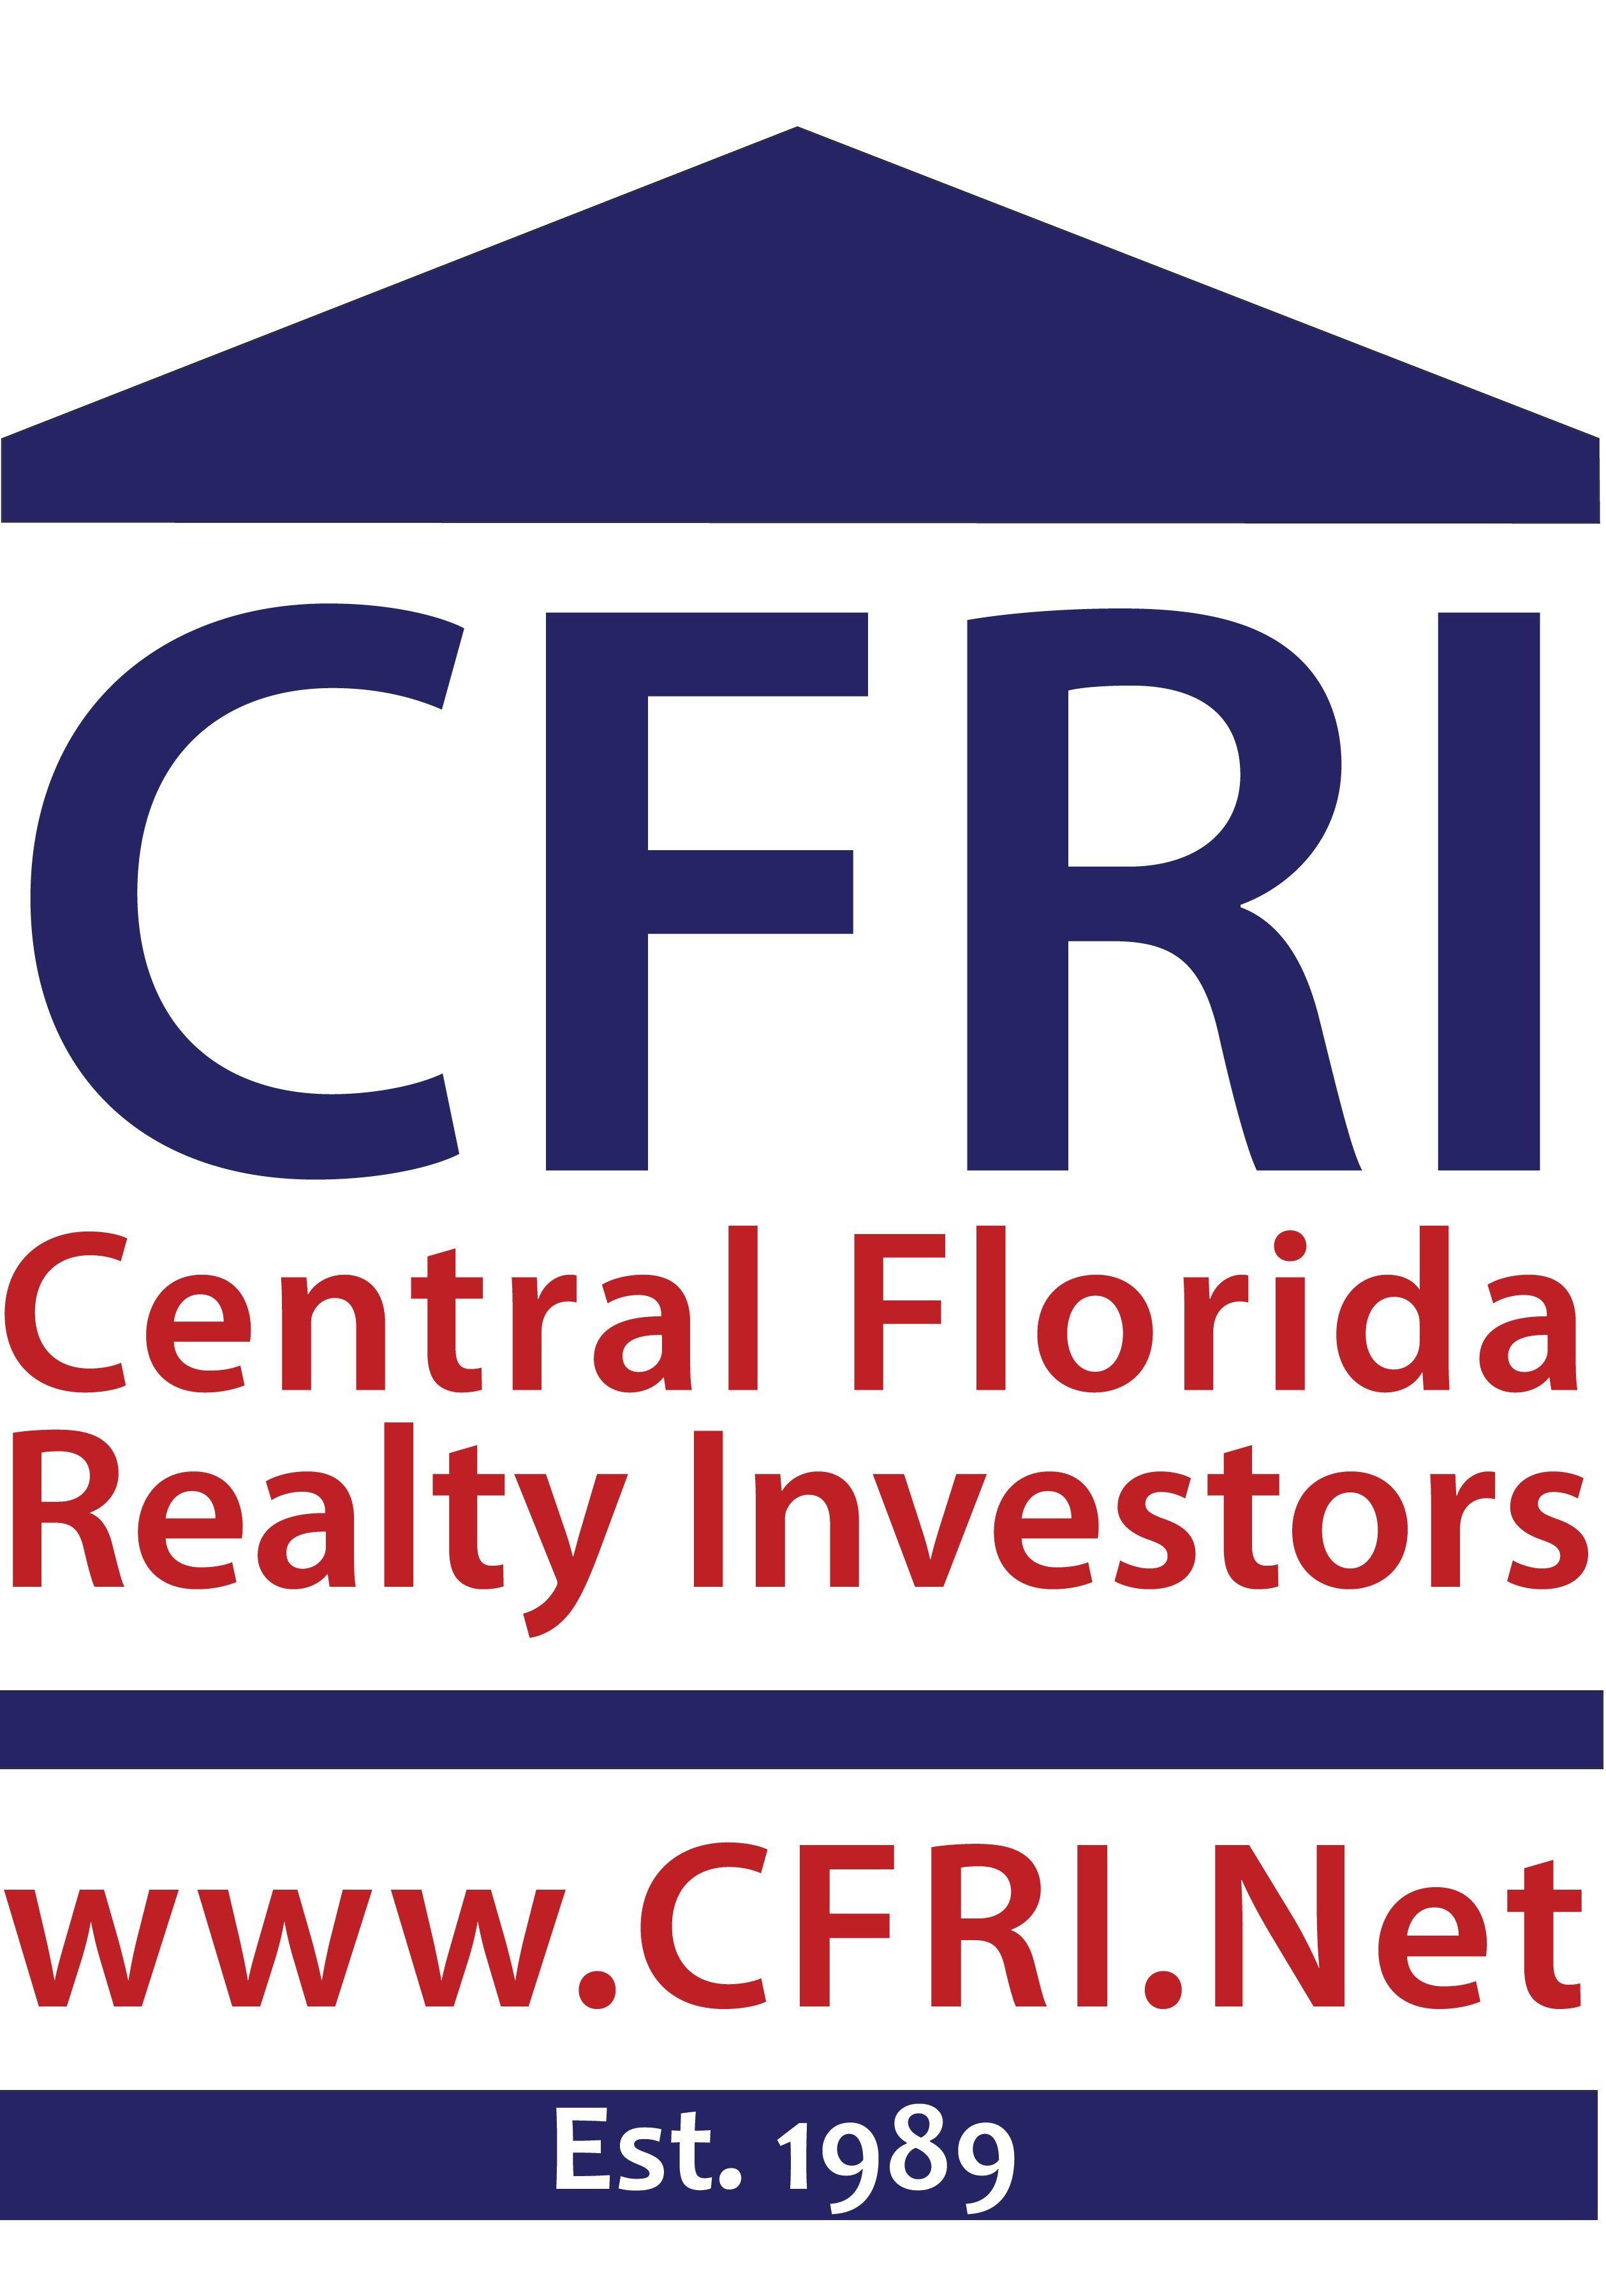 Central Florida Realty Investors